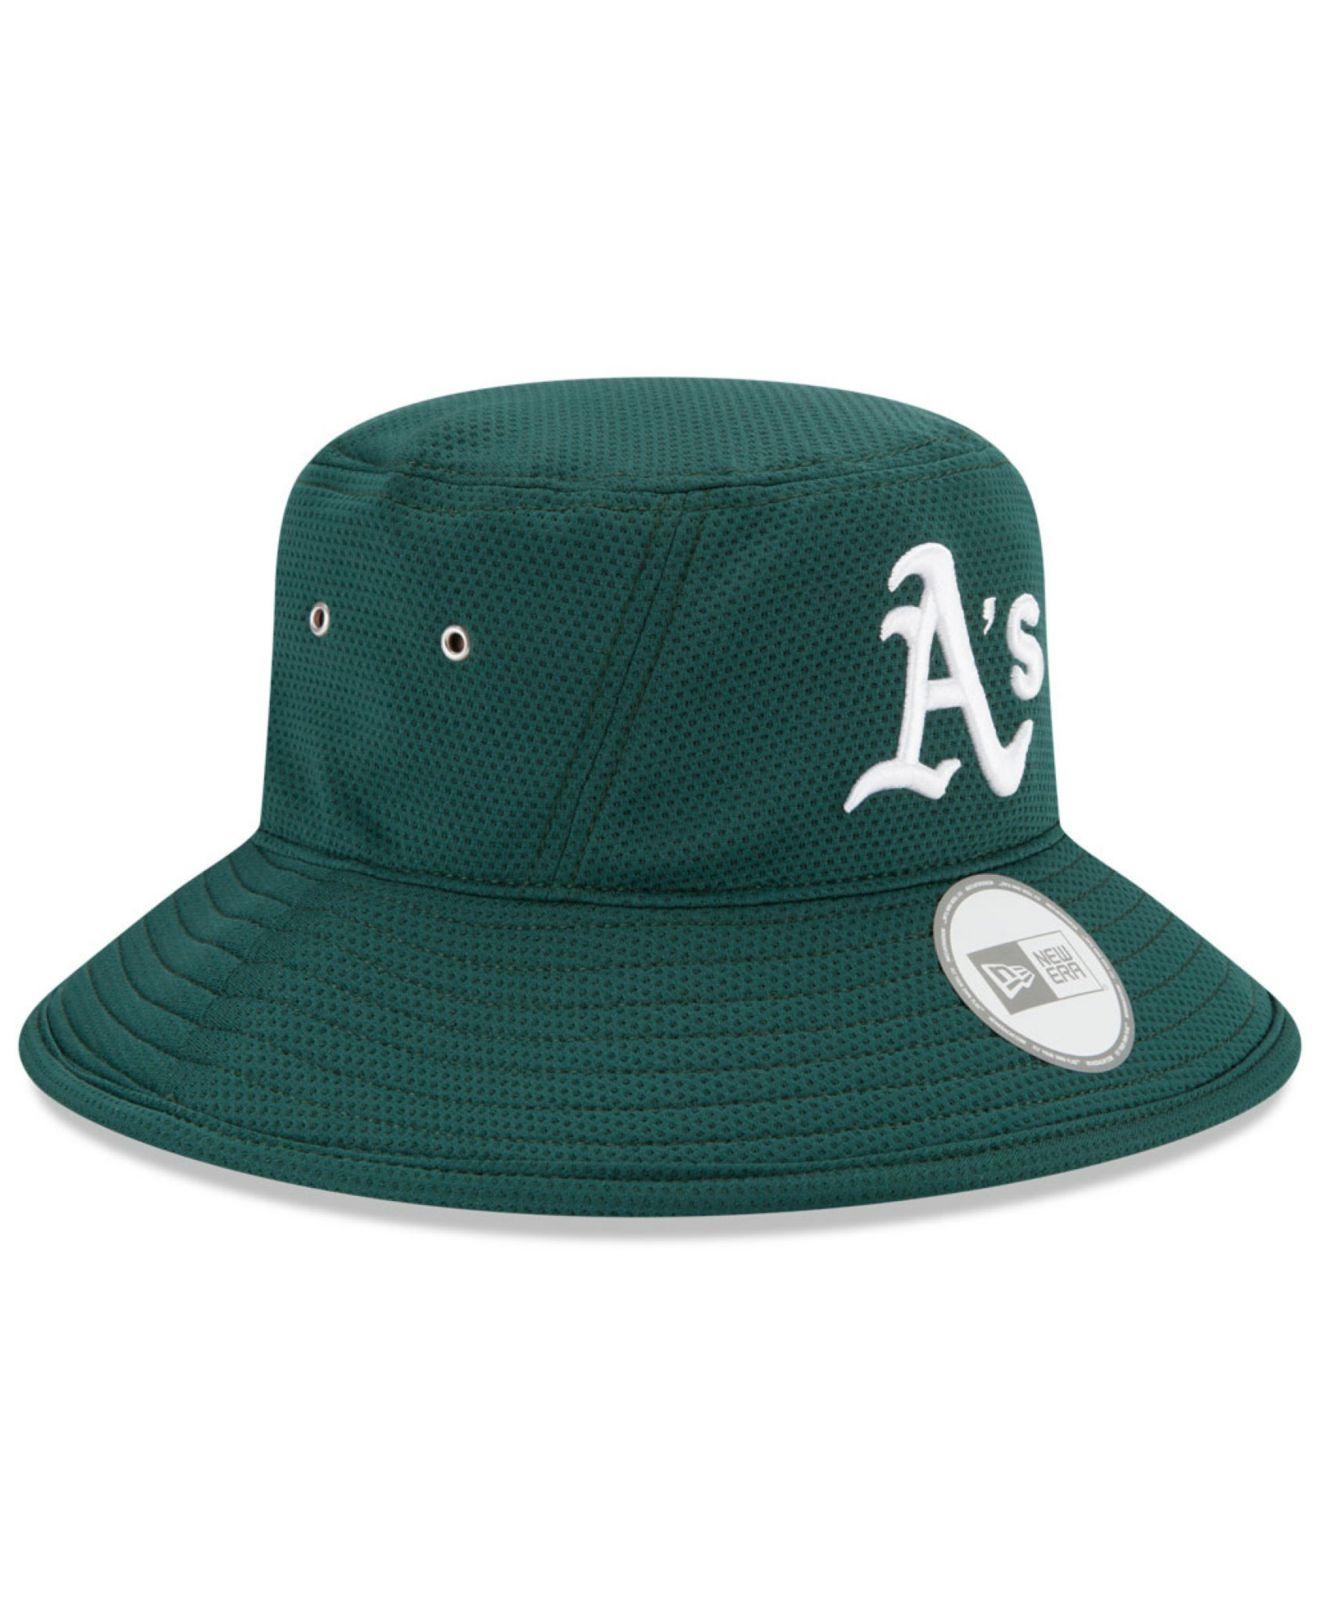 e843b57b138 low price lyst ktz oakland athletics redux bucket hat in green f627b a5870